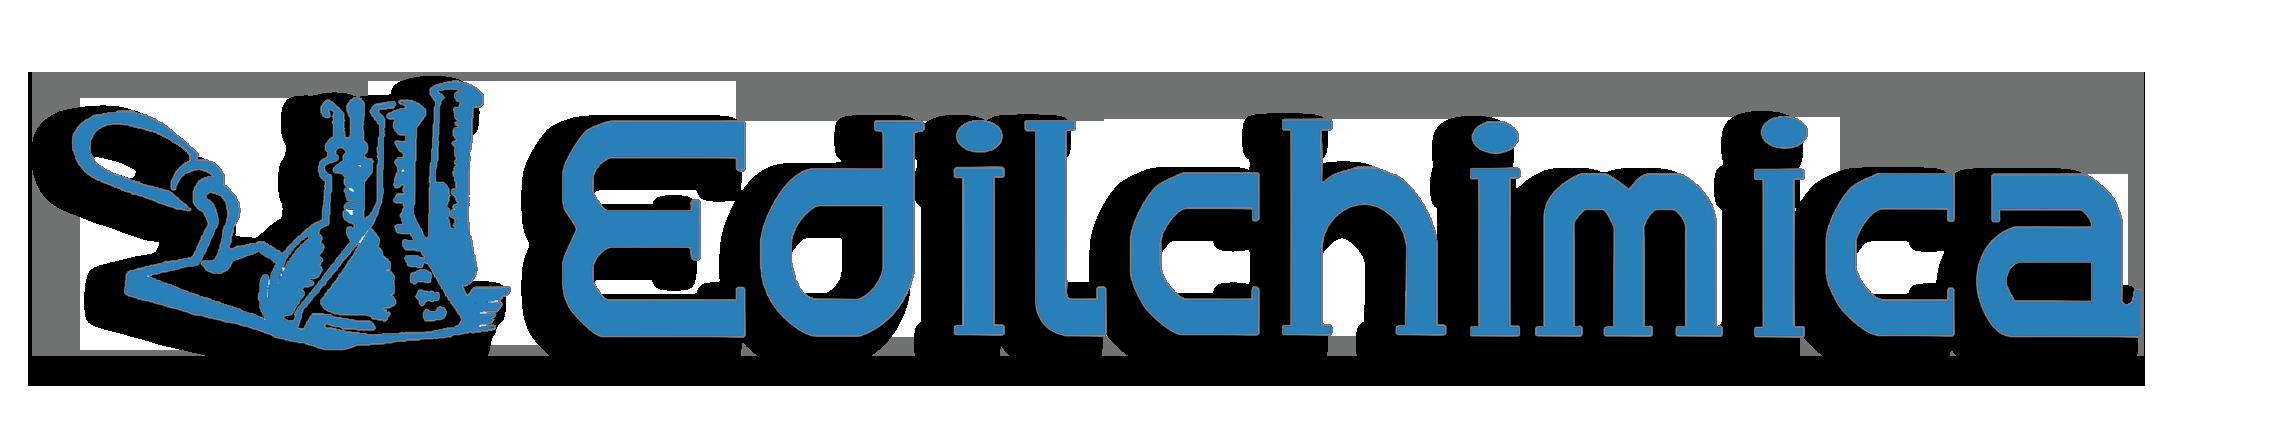 Edilchimica